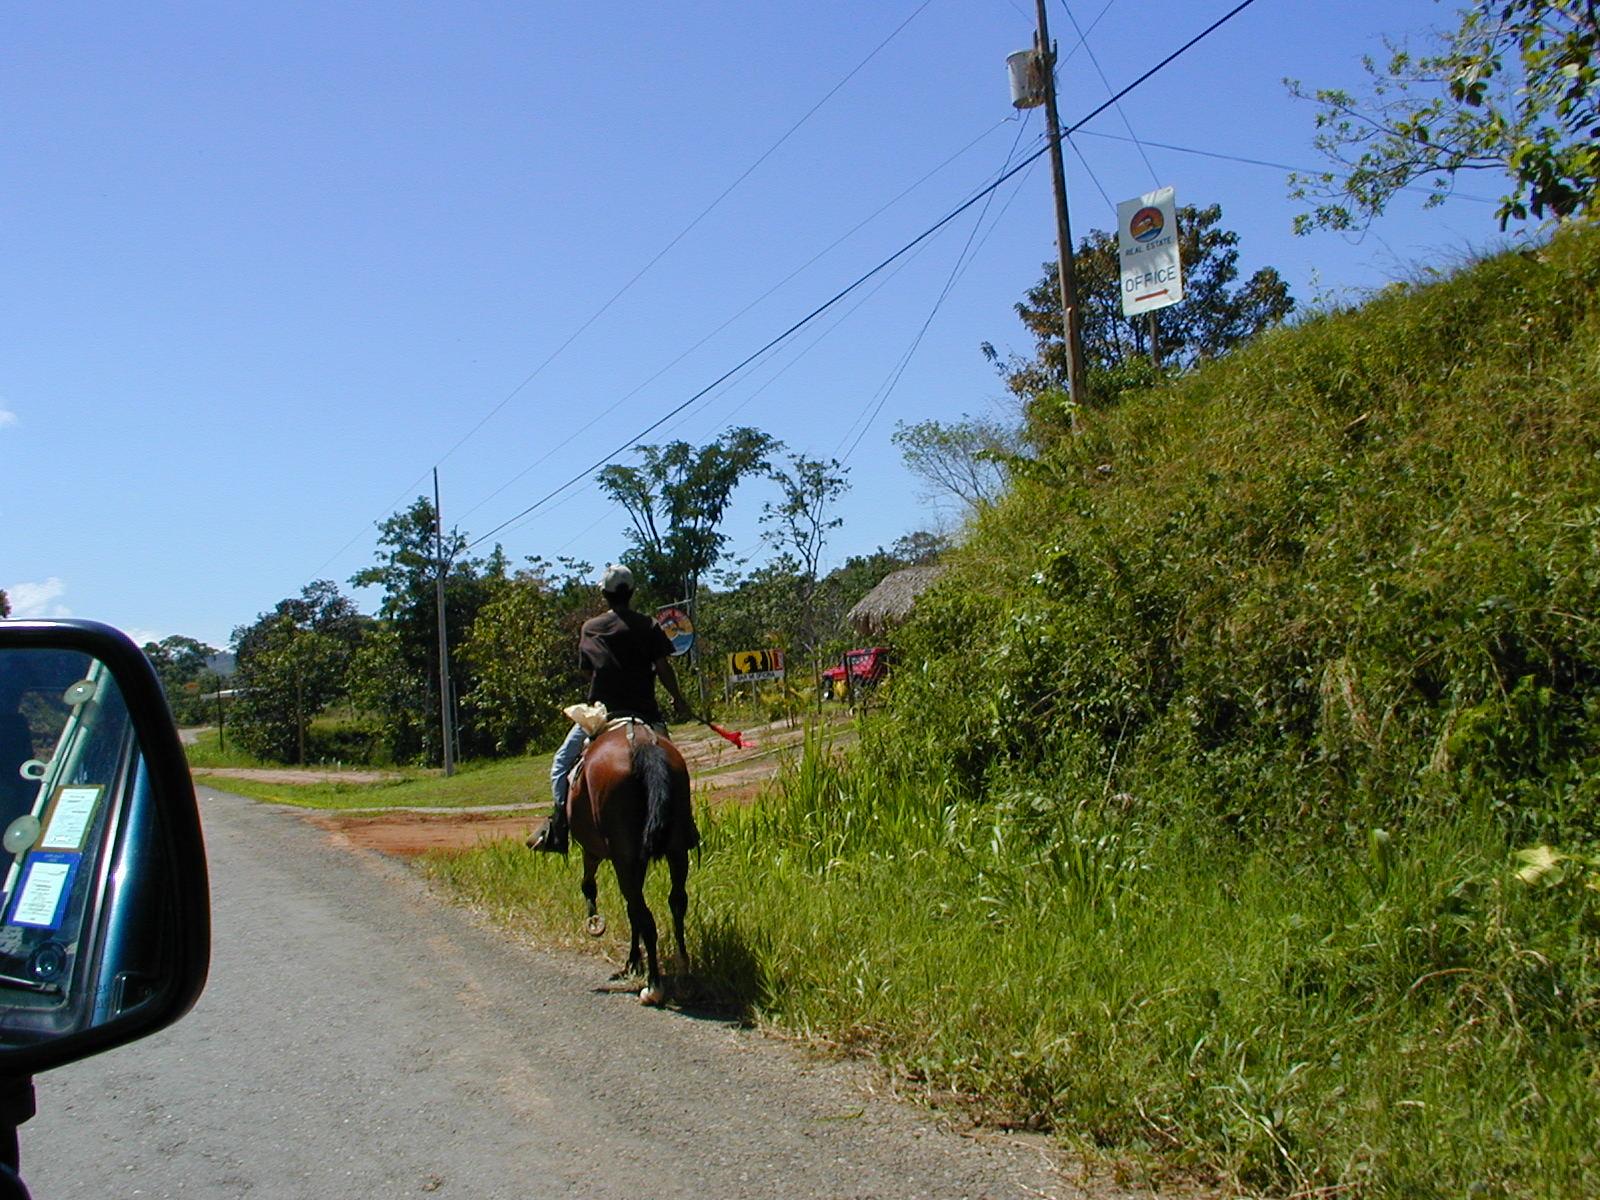 Road Horse2.JPG